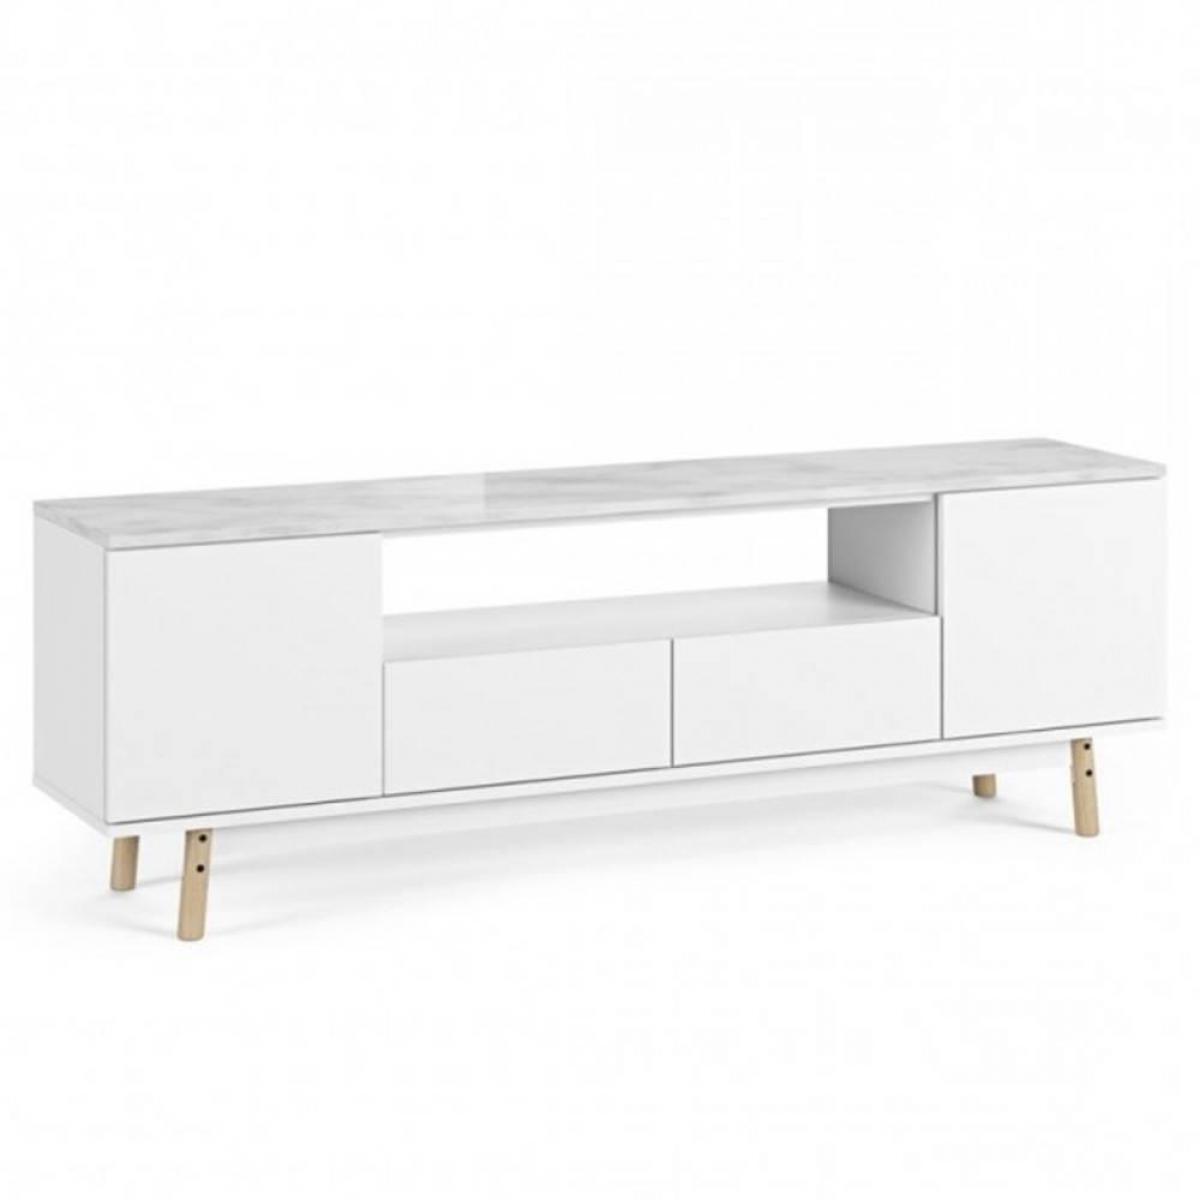 Inside 75 meuble TV LYON plateau marbre blanc pied chêne